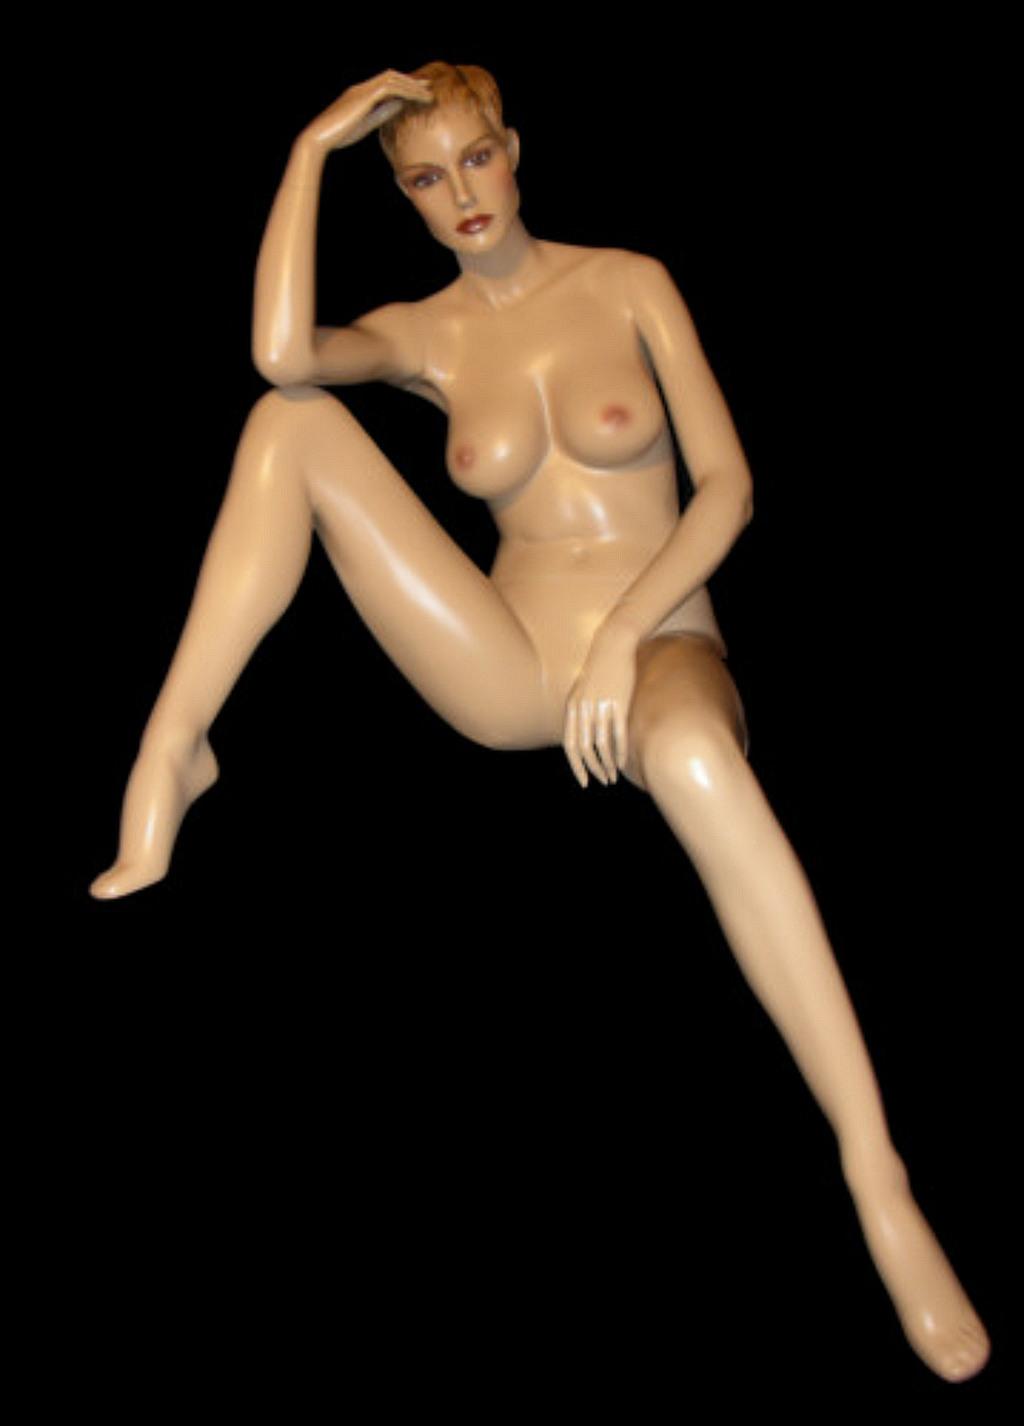 Секс с манекеном картинки 5 фотография